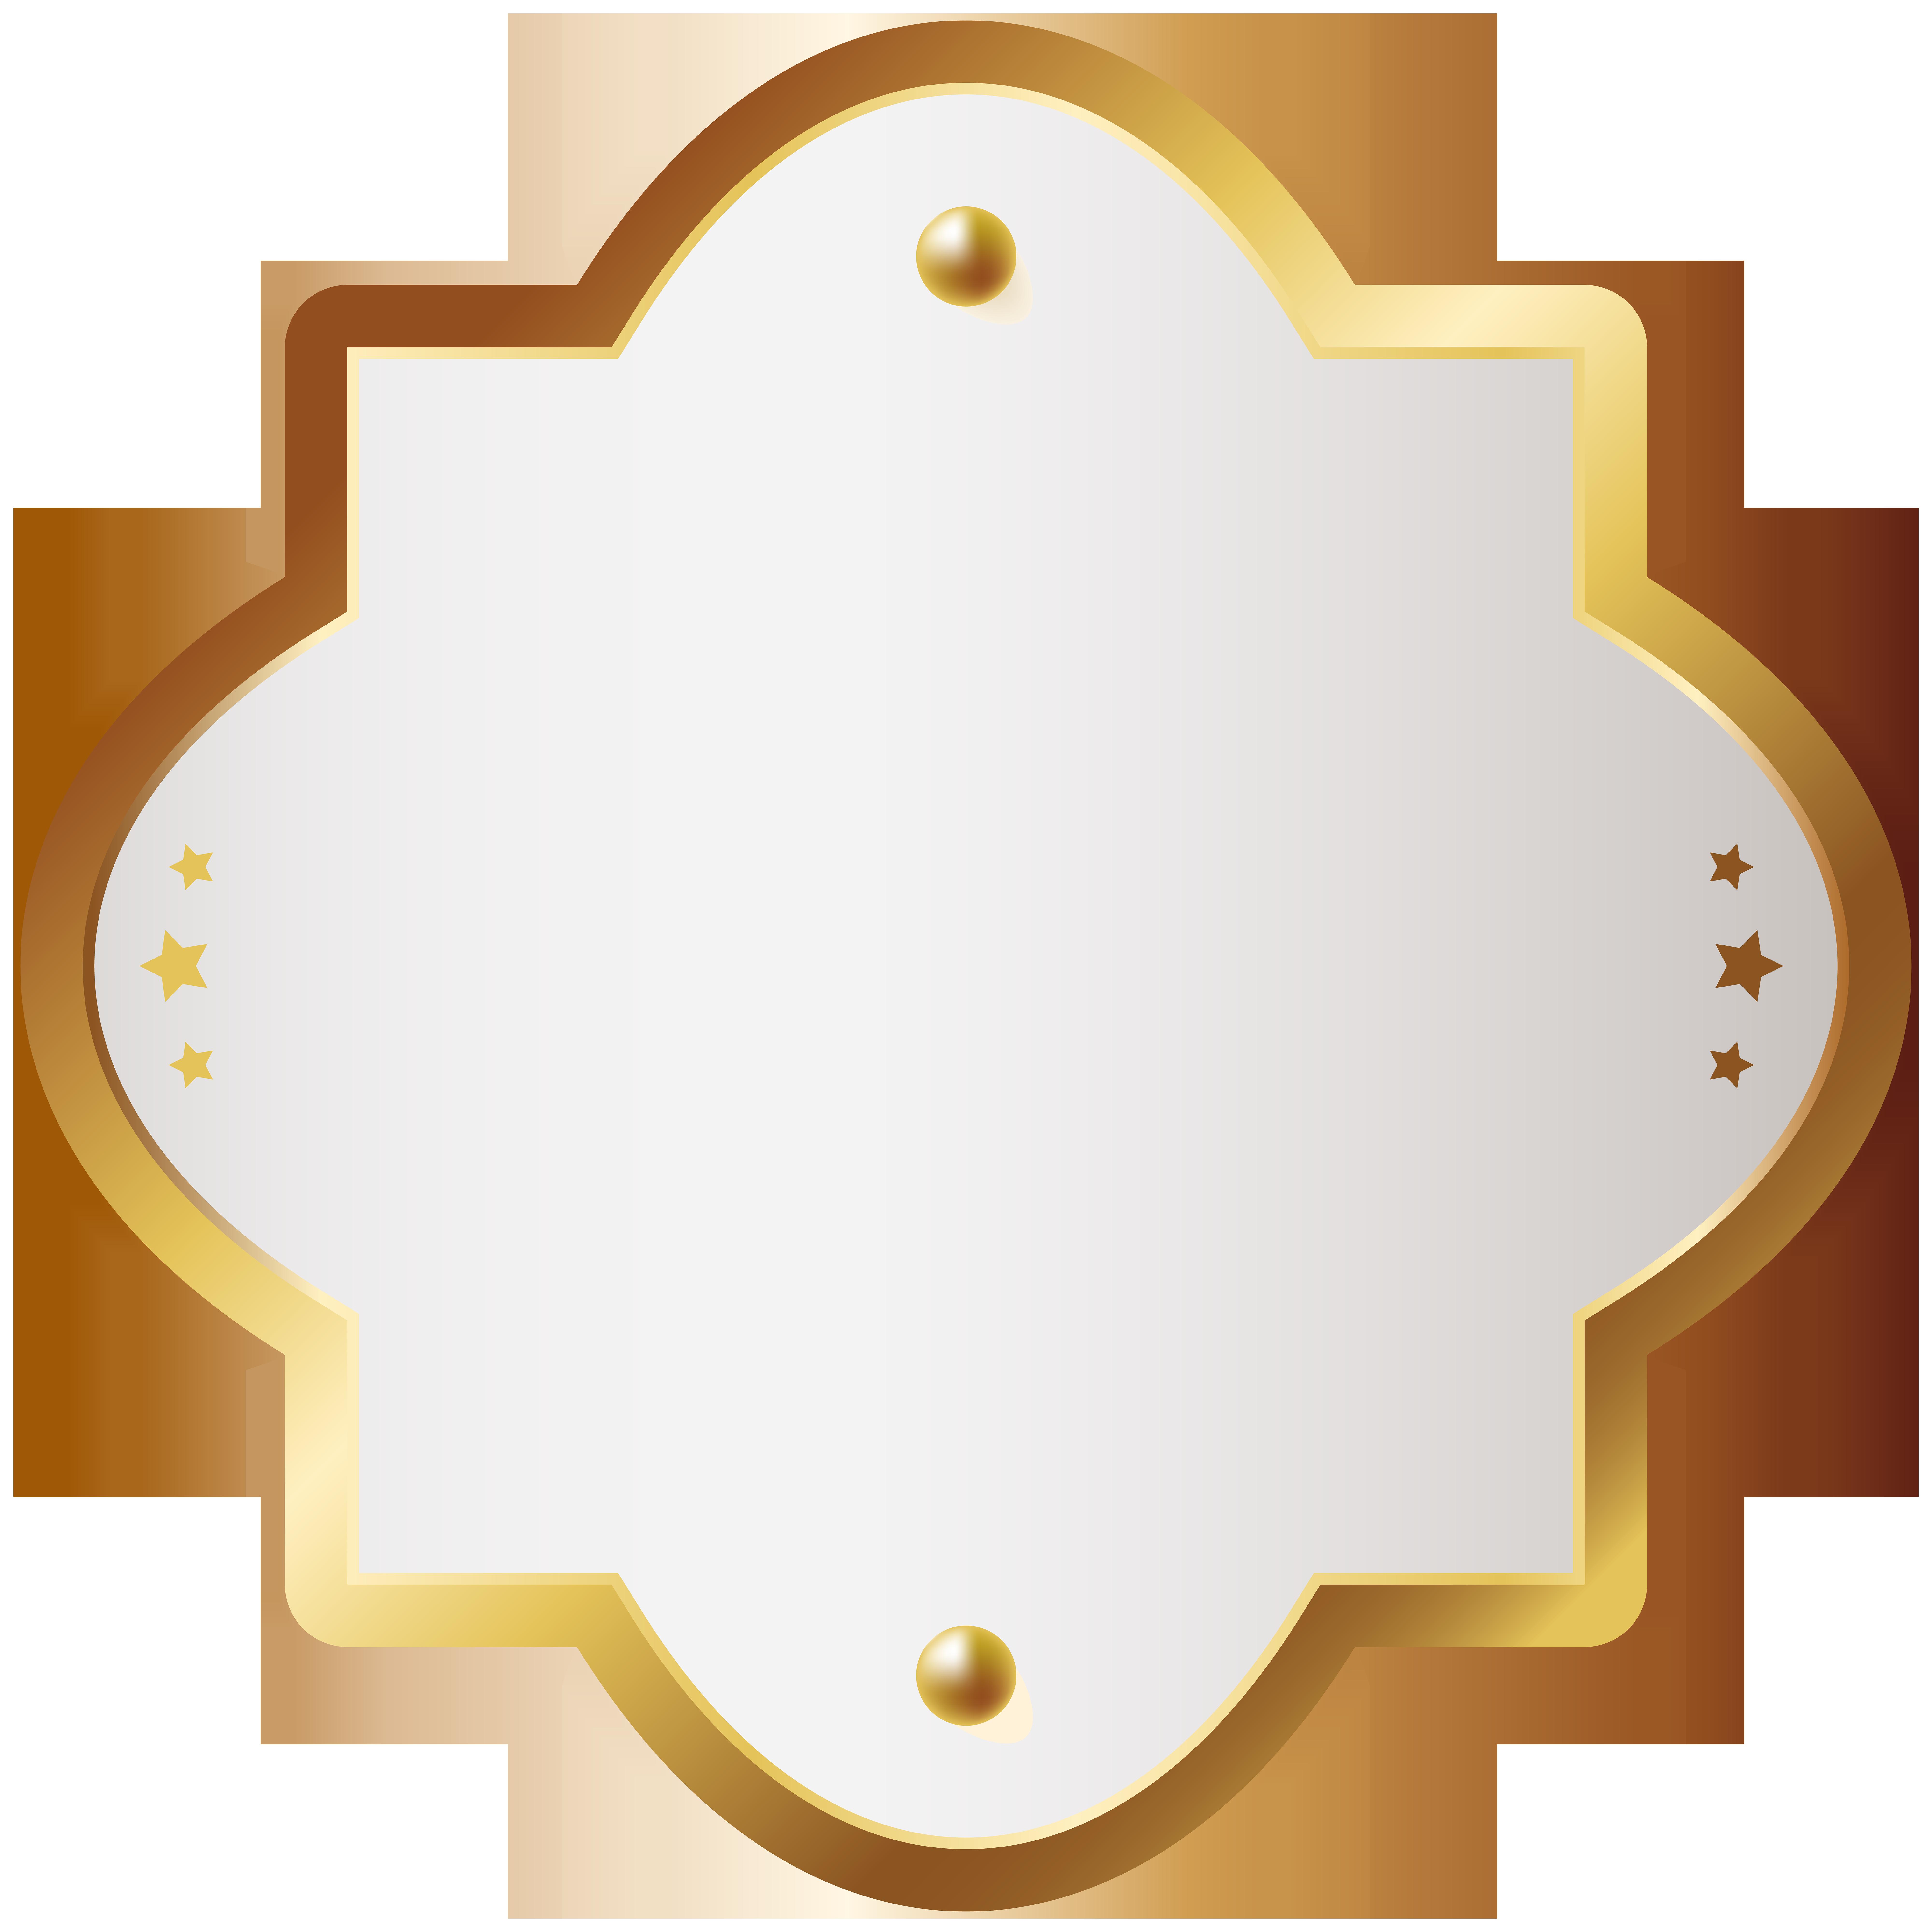 Facebook clipart badge. Decorative gold clip art